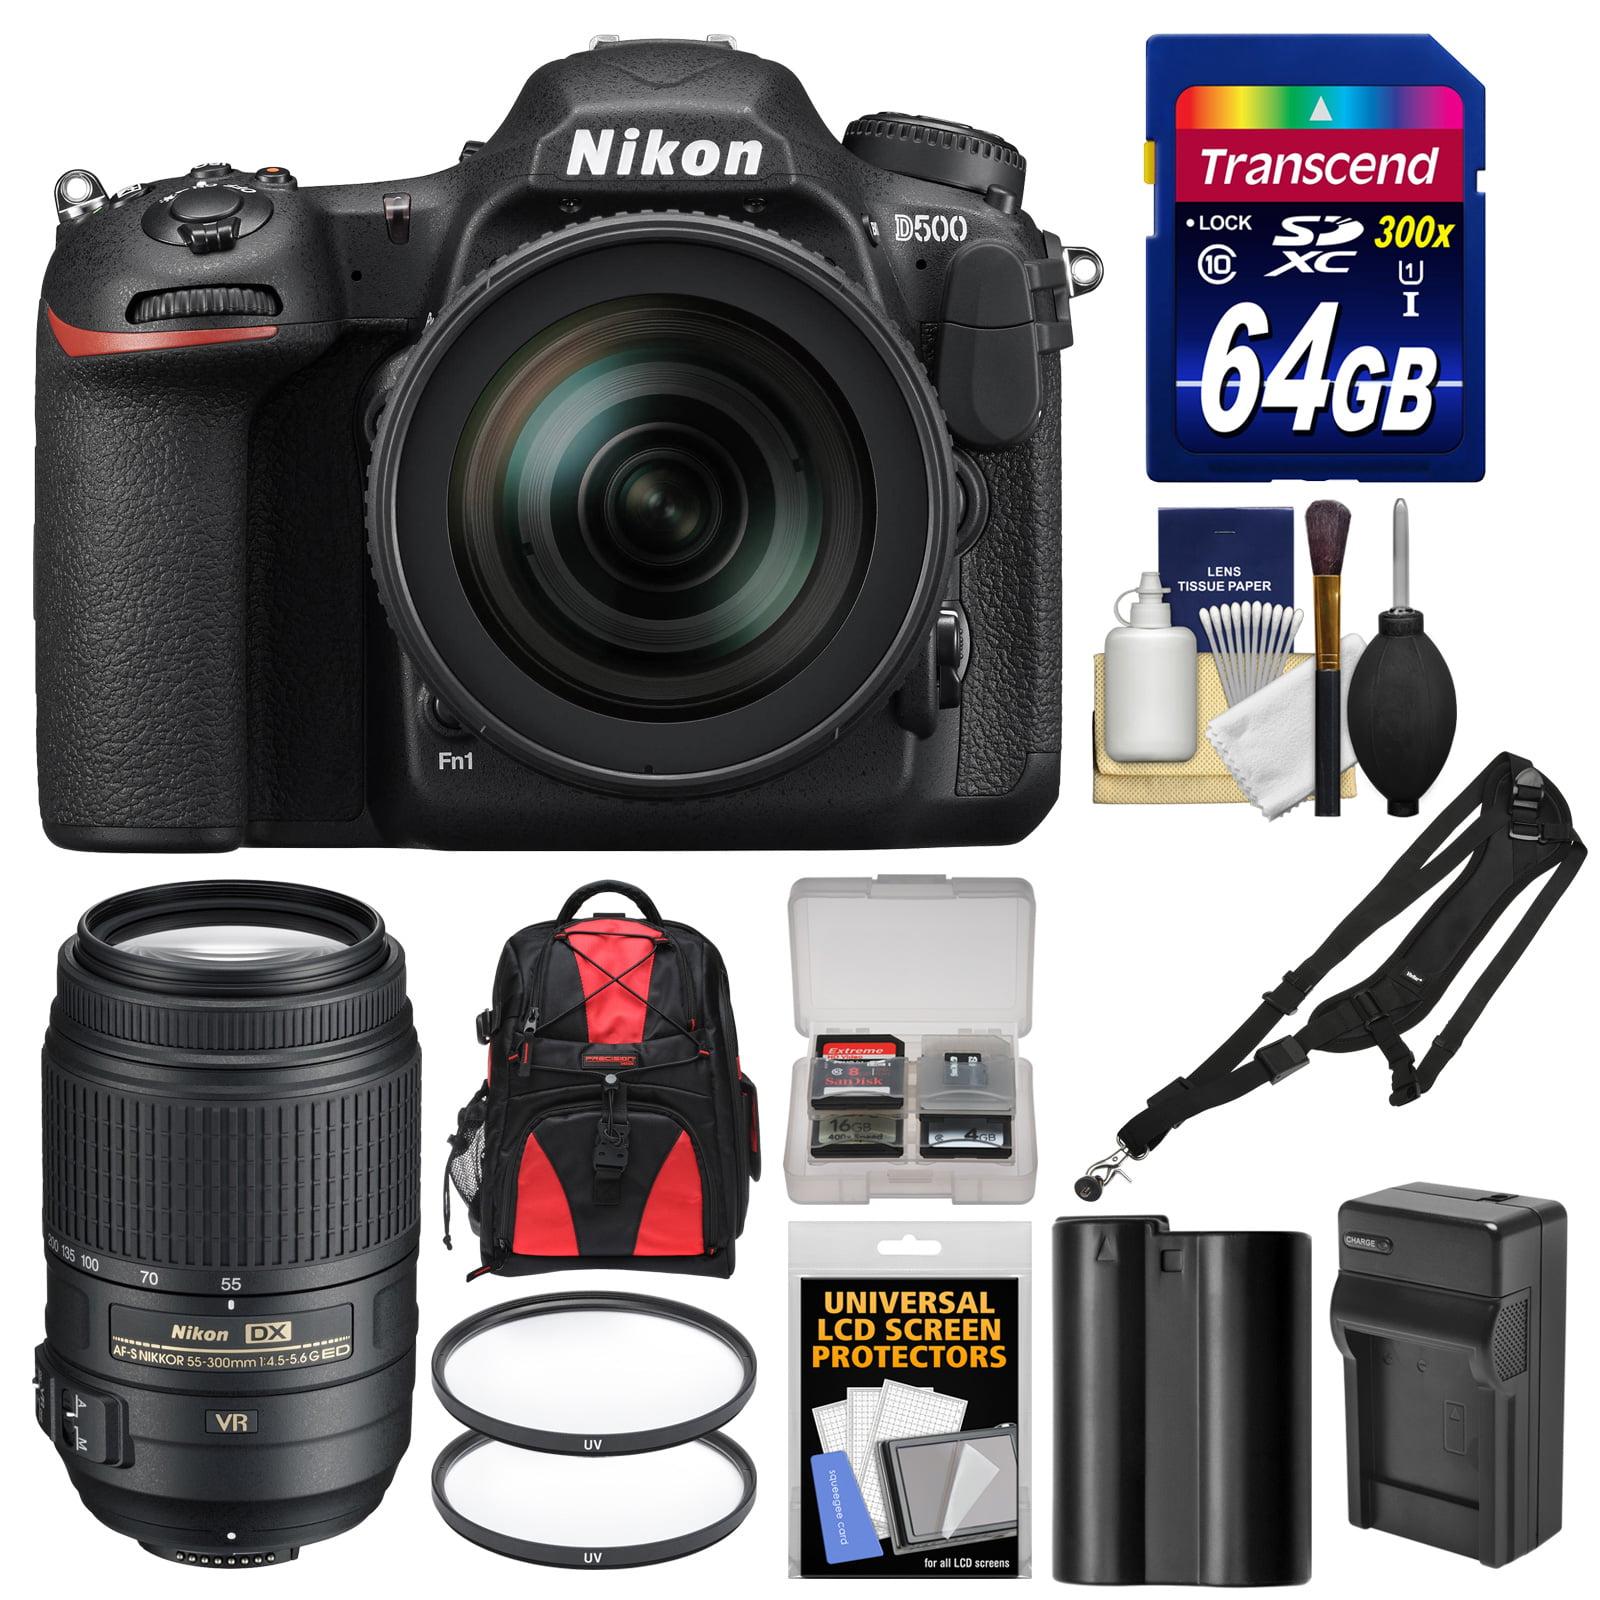 Nikon D500 Wi-Fi 4K Digital SLR Camera & 16-80mm VR Lens with 55-300mm VR Lens + 64GB Card + Backpack +... by Nikon